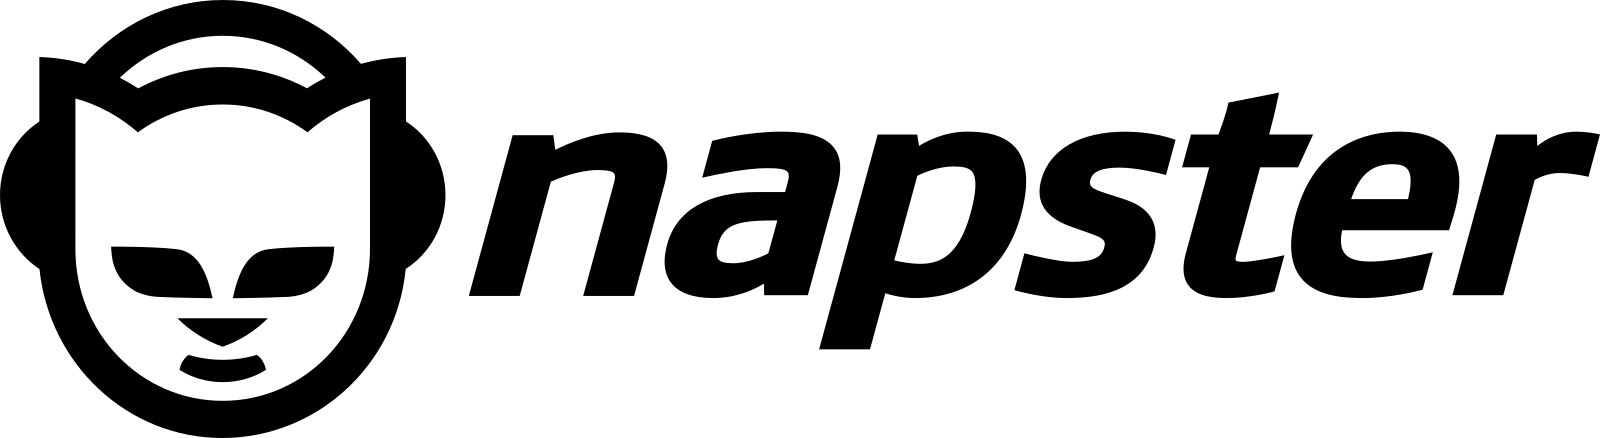 napster logo 2 - Napster Logo